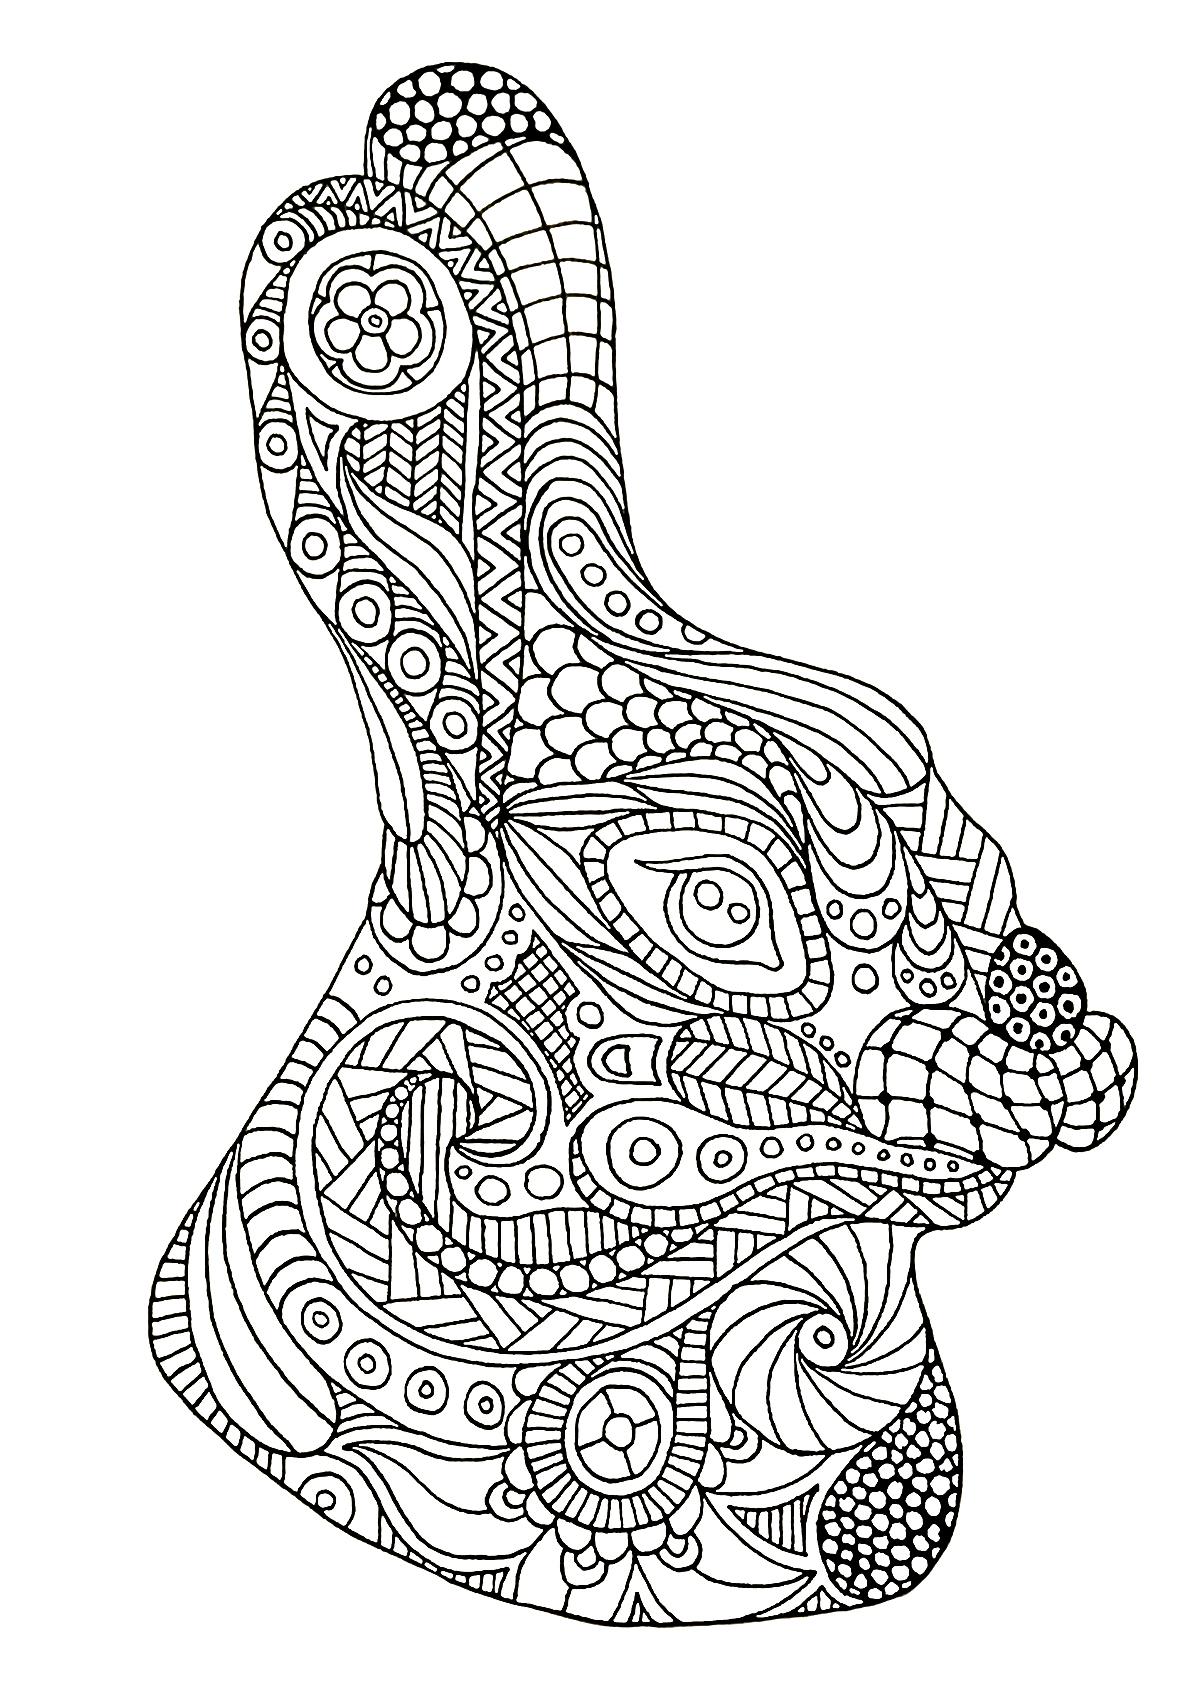 Coloriage tête de lapin (Zentangle)